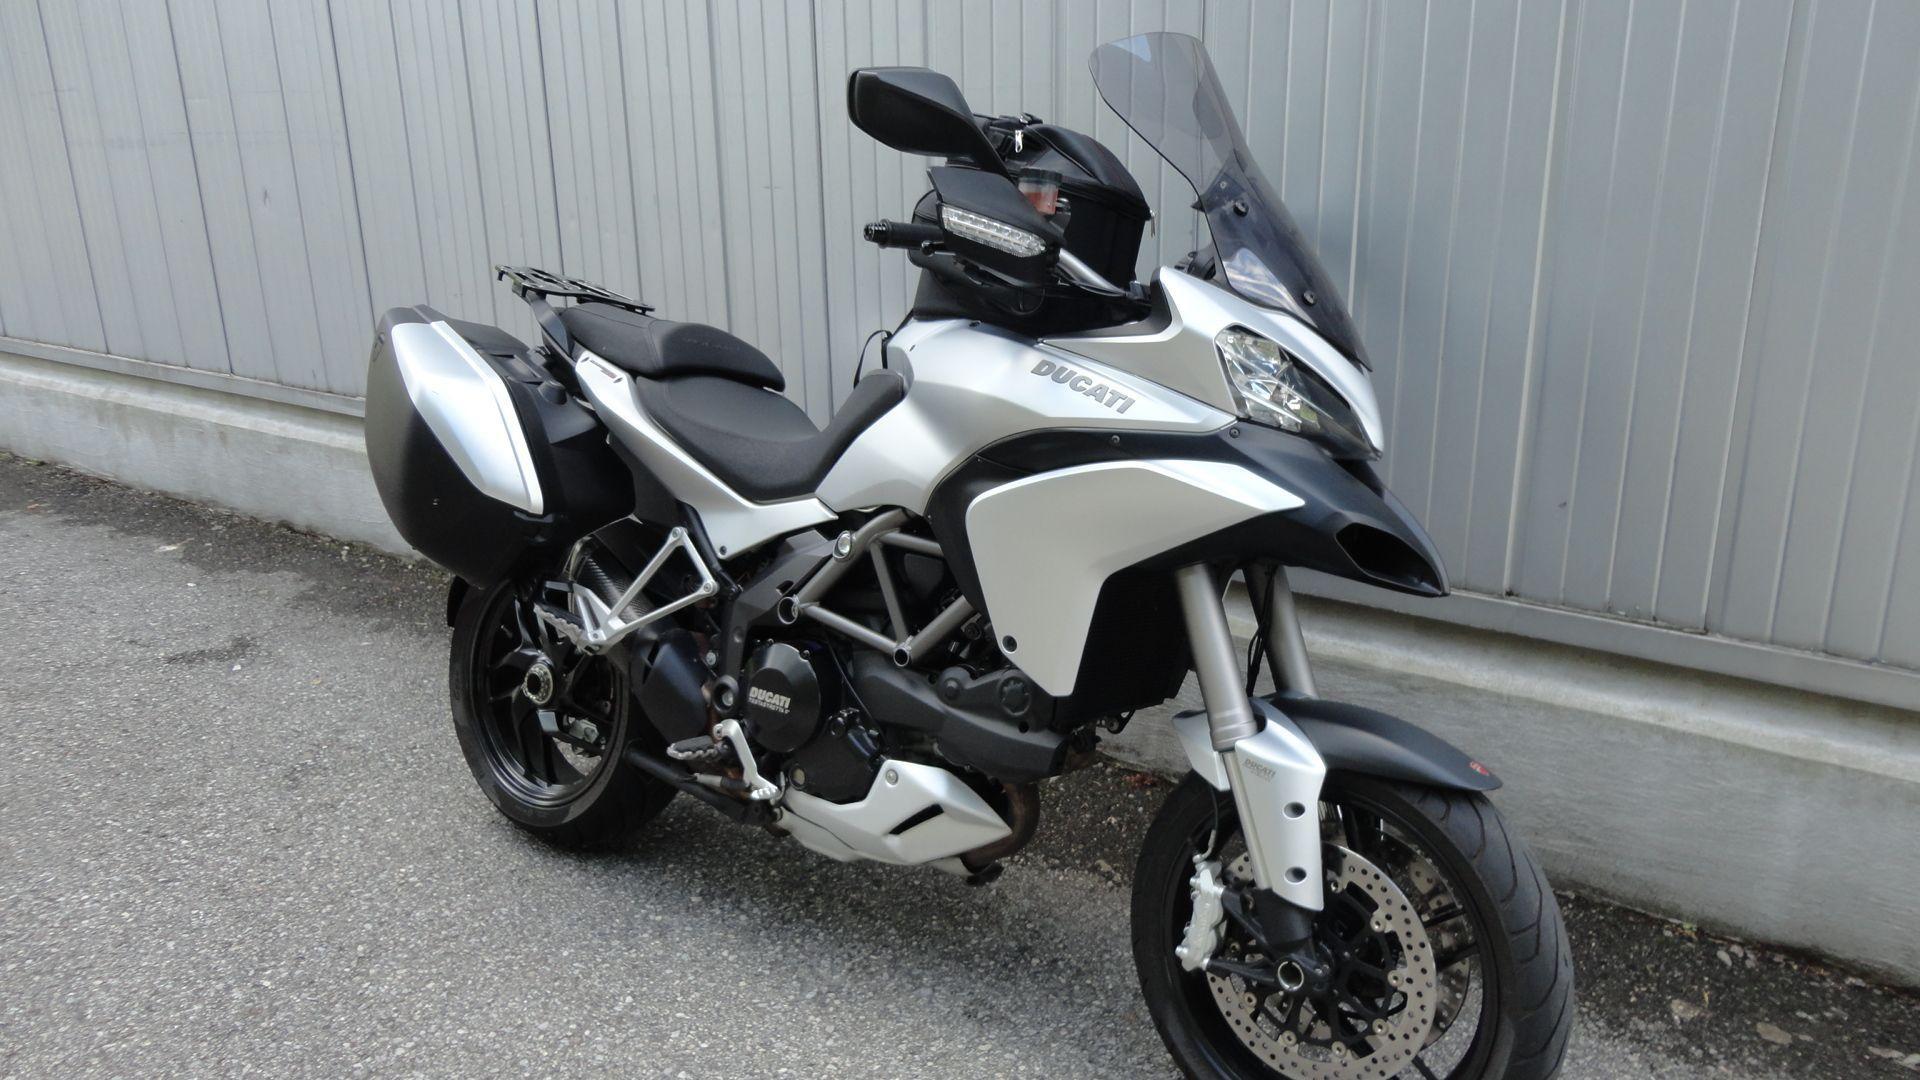 motorrad occasion kaufen ducati 1200 multistrada abs moto art sagl grancia. Black Bedroom Furniture Sets. Home Design Ideas